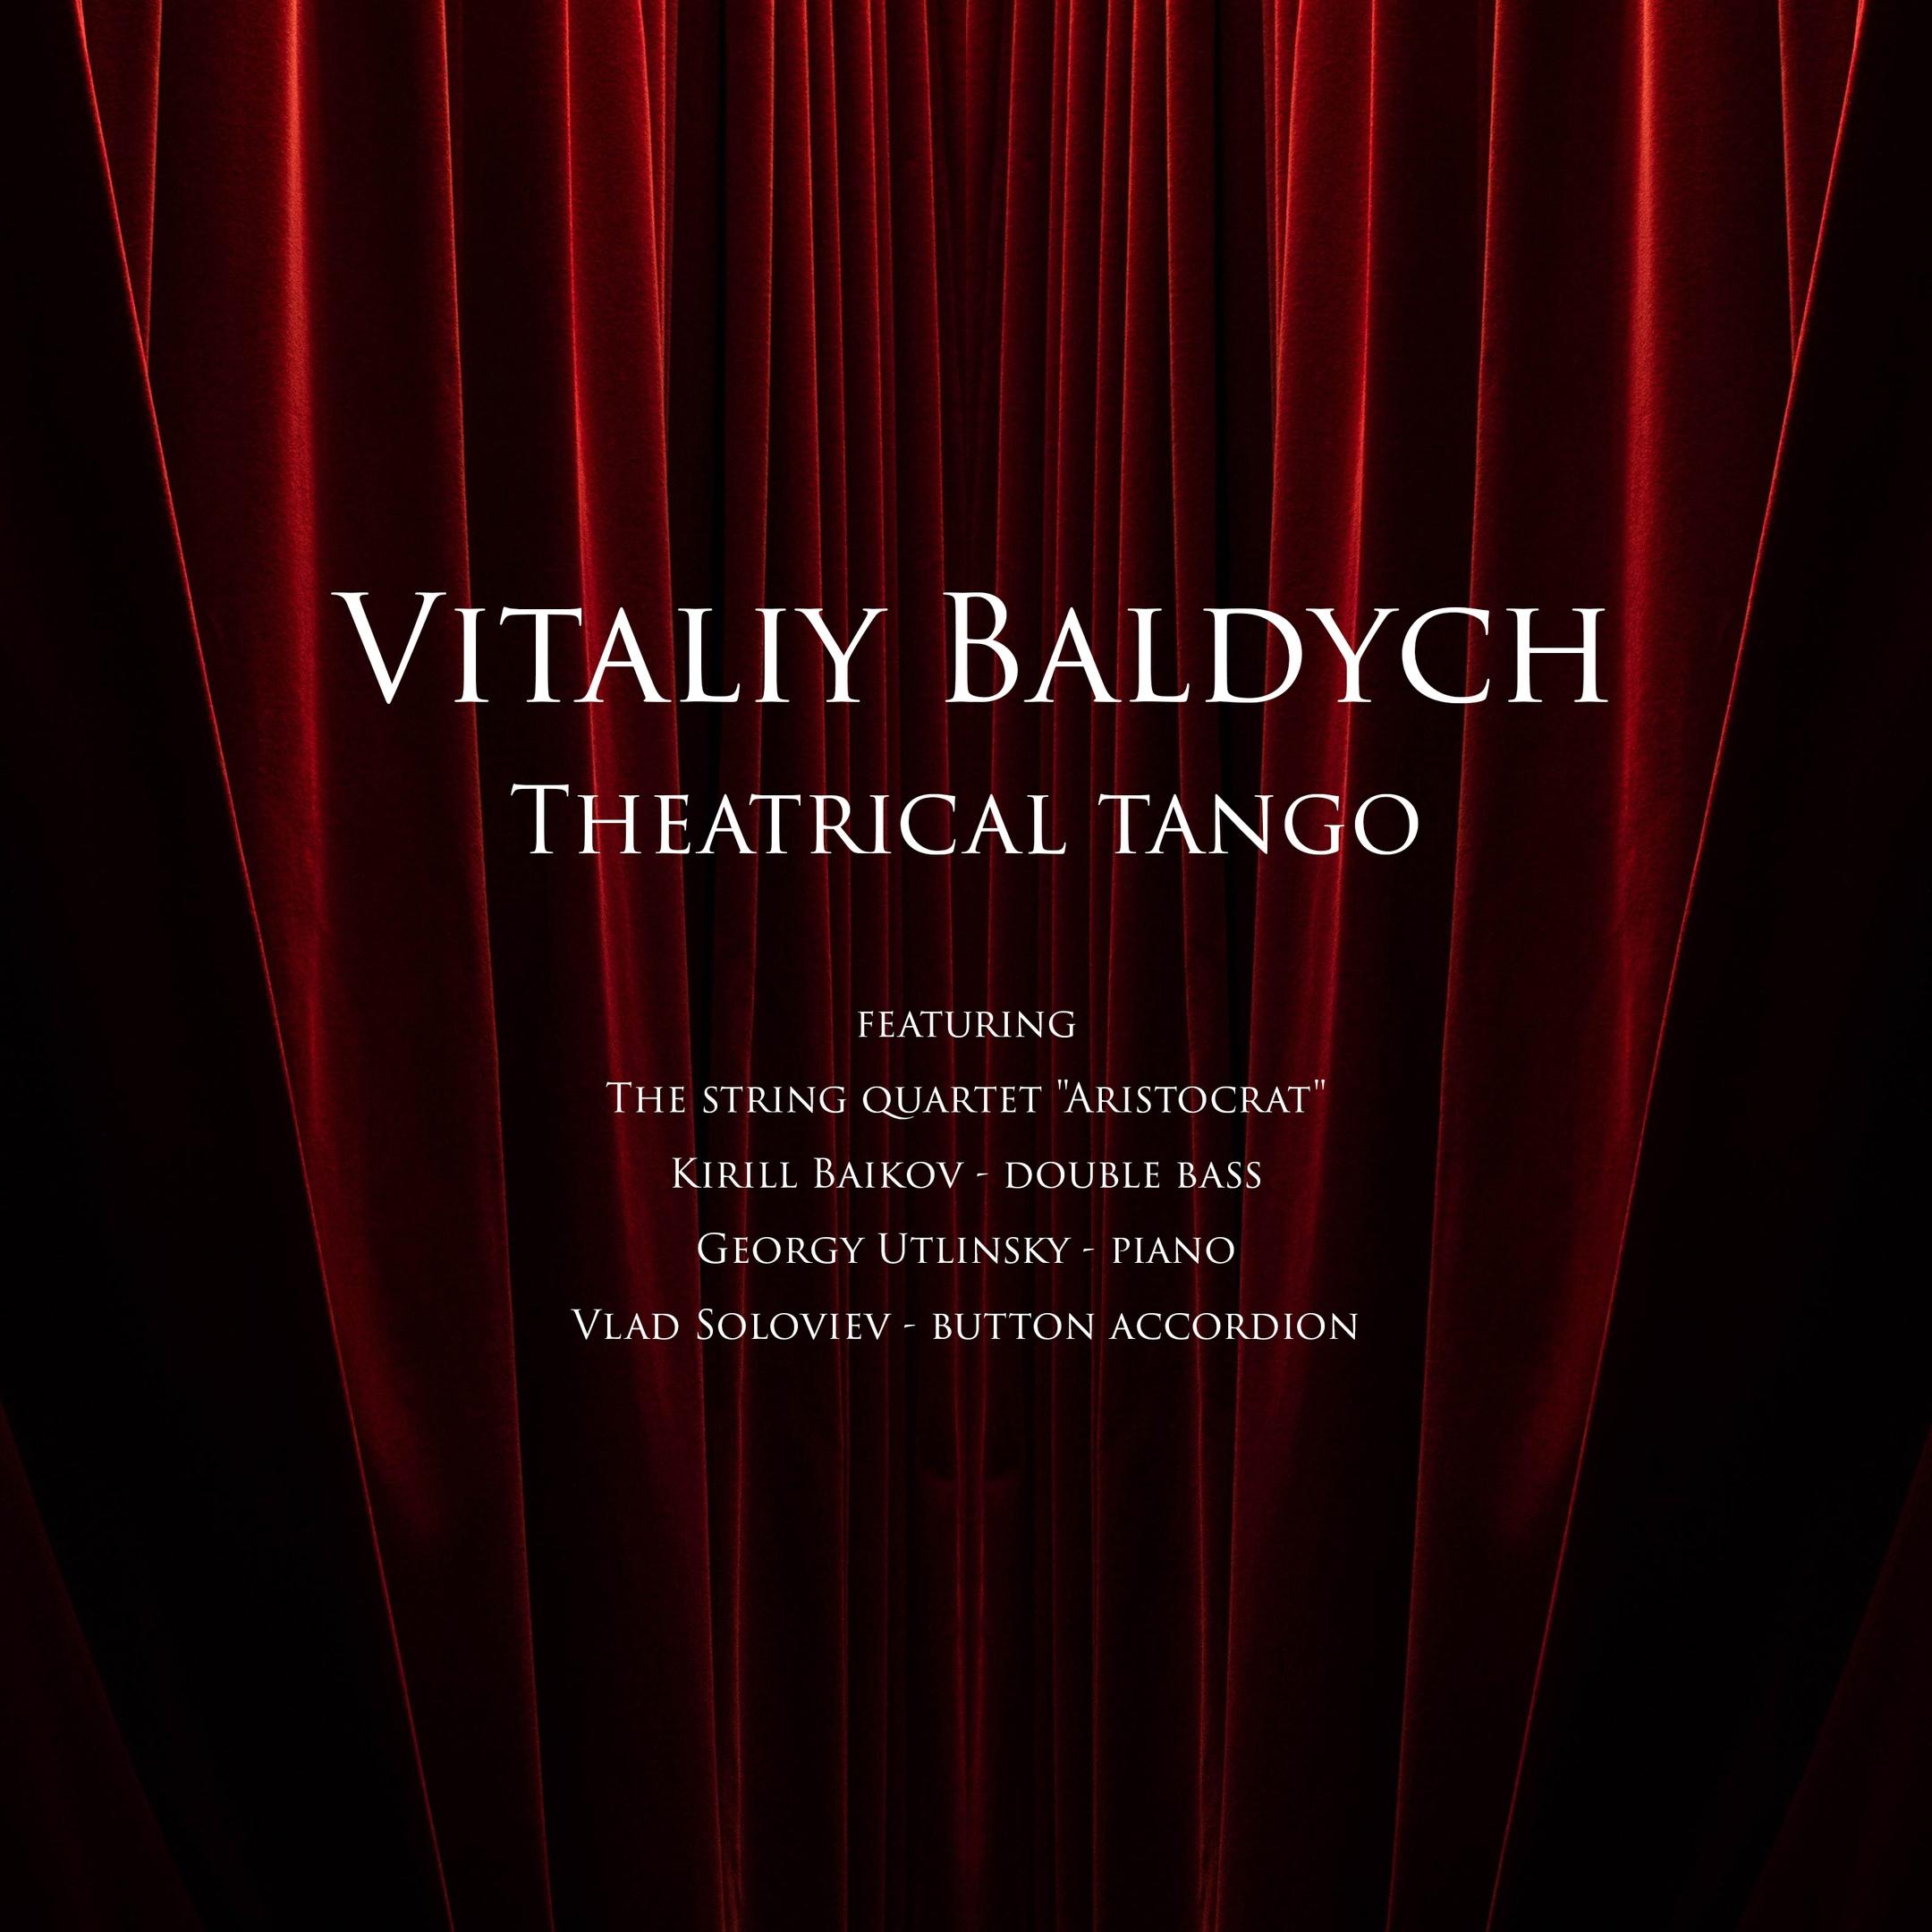 Theatrical tango